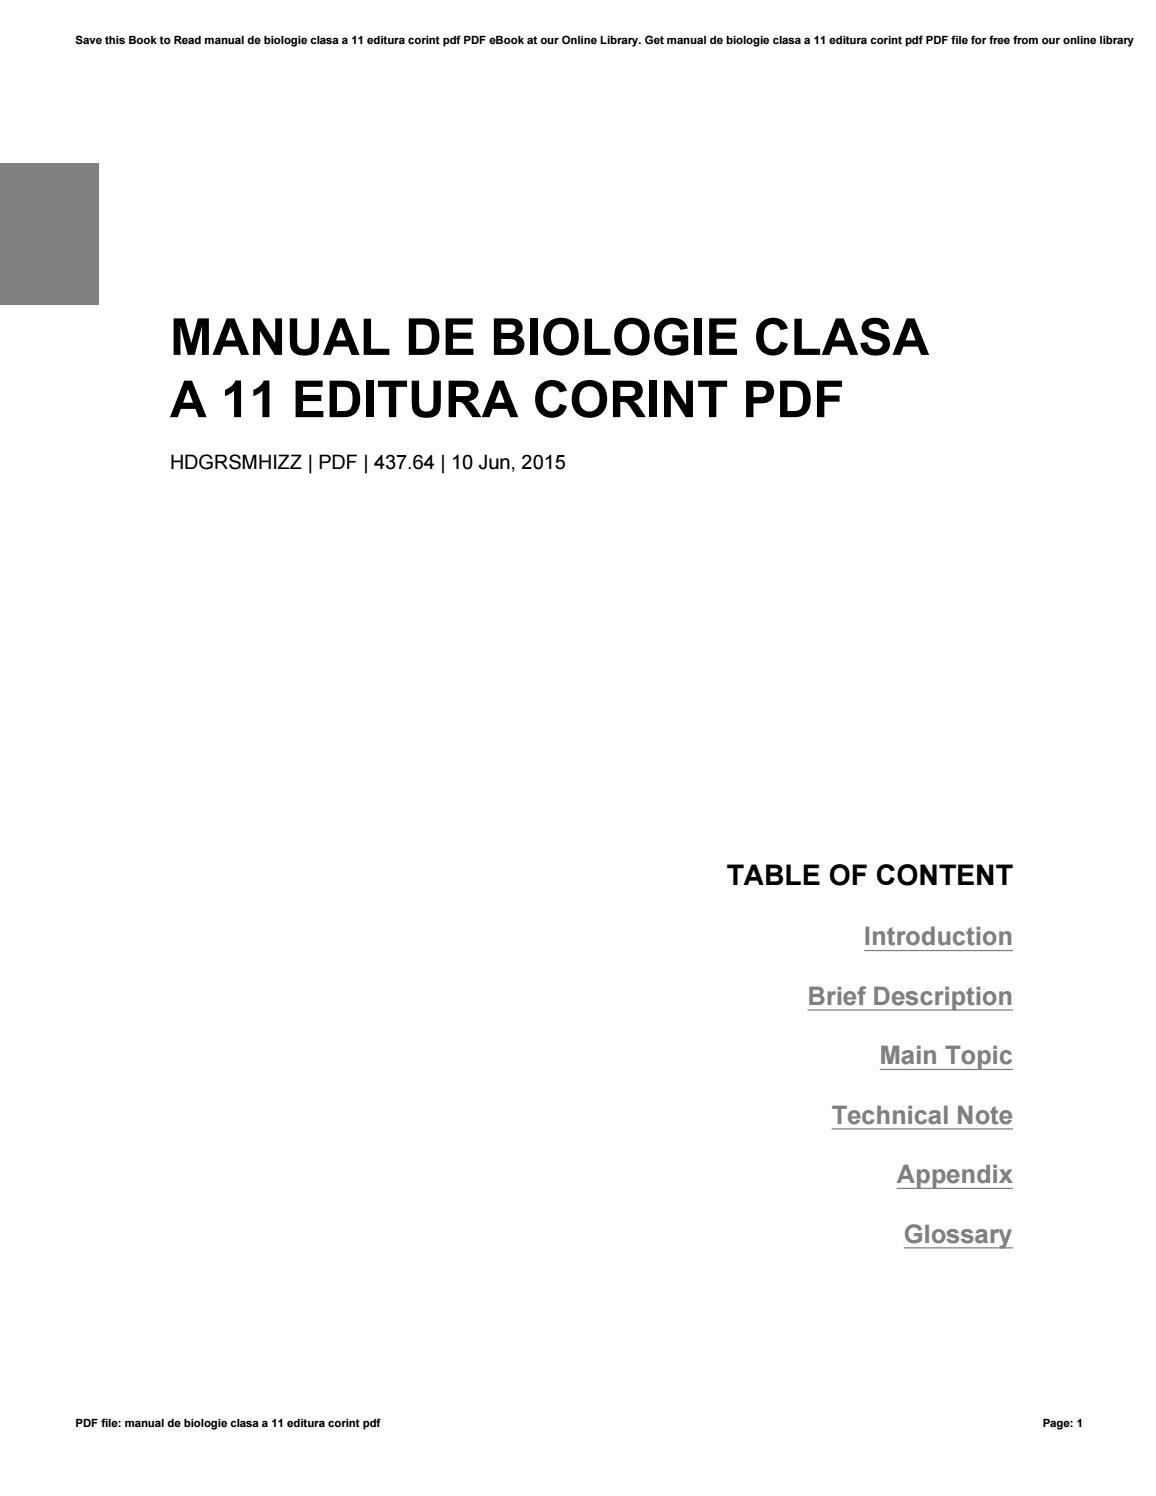 Manual de biologie clasa a 11 editura corint pdf by ElijahGonzalez4775 -  issuu